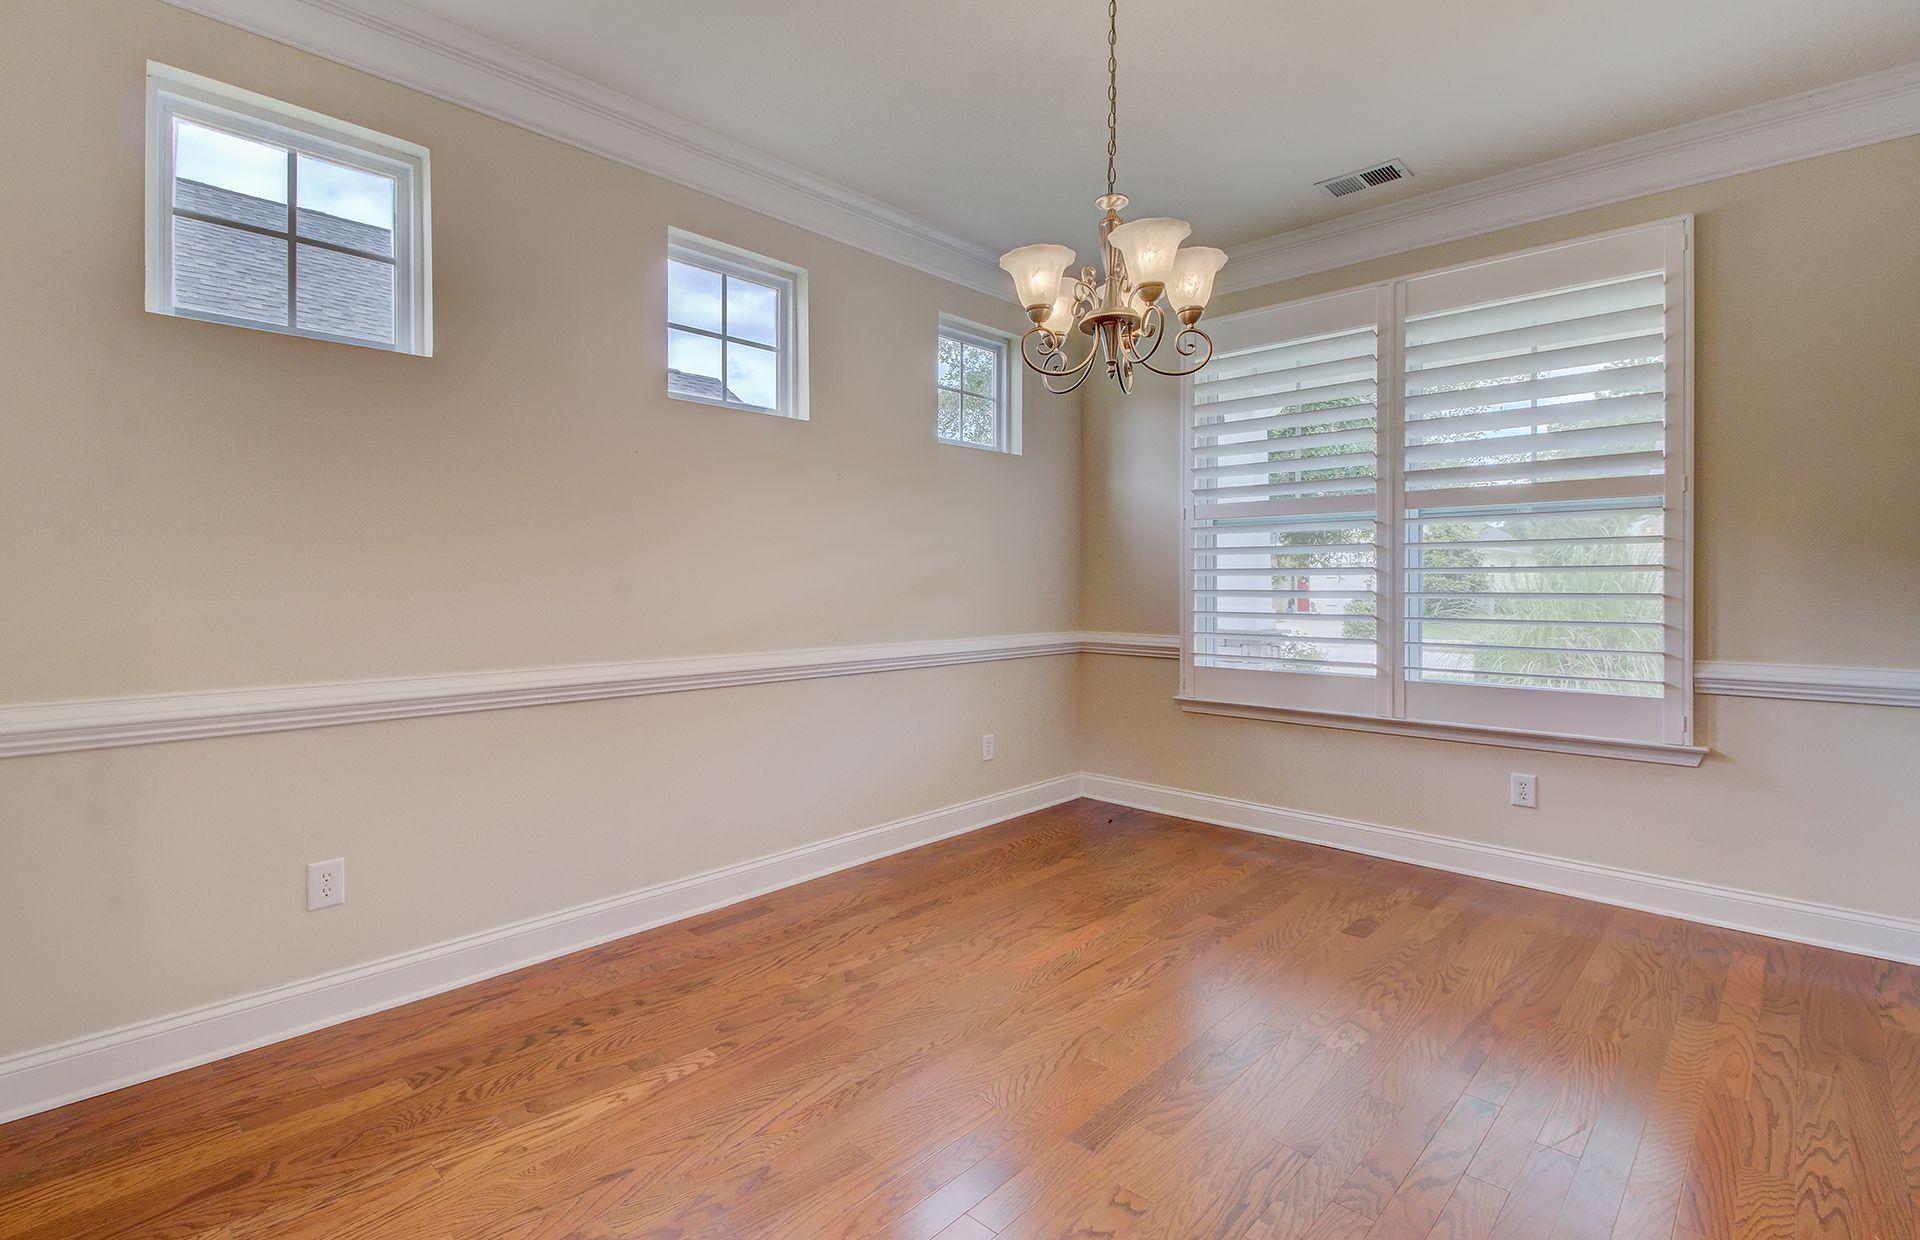 Linnen Place Homes For Sale - 1275 Shingleback, Mount Pleasant, SC - 32